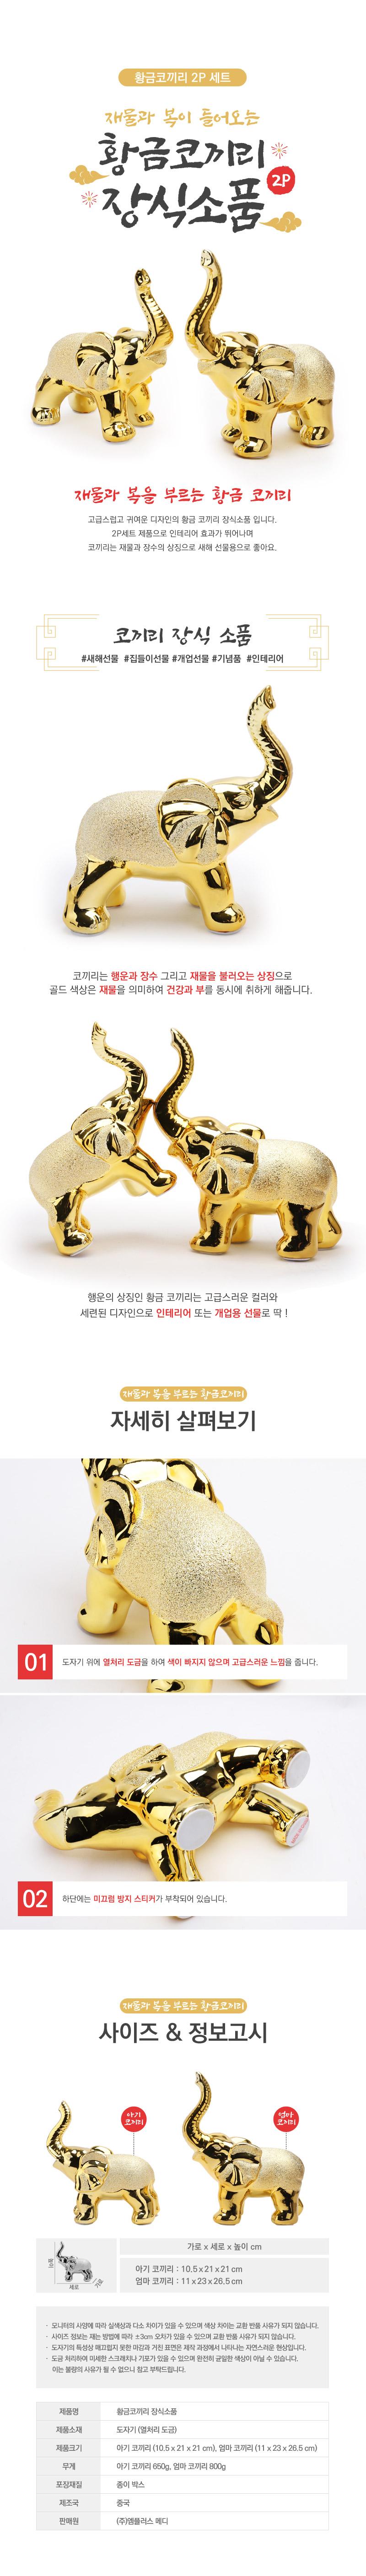 elephant.jpg?dummy=2019-01-24%2012%20:%2003%20:%2016